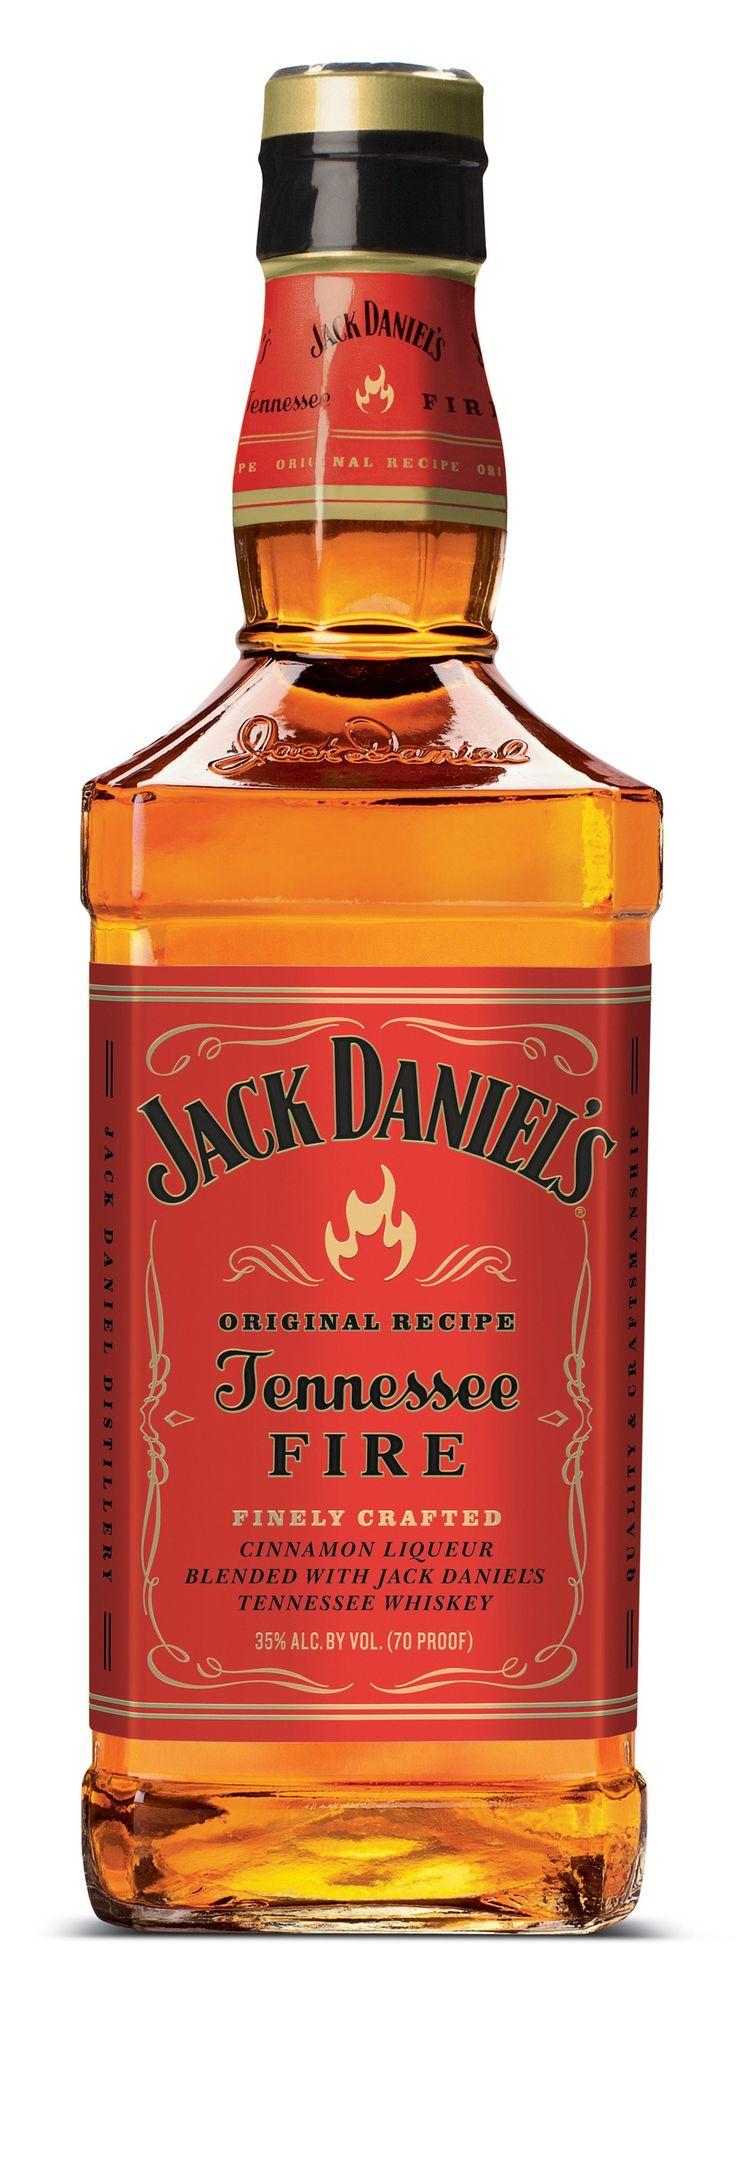 1000 images about engraved bourbon bottles on pinterest bottle gentleman jack and jack - Tennessee cognac ...